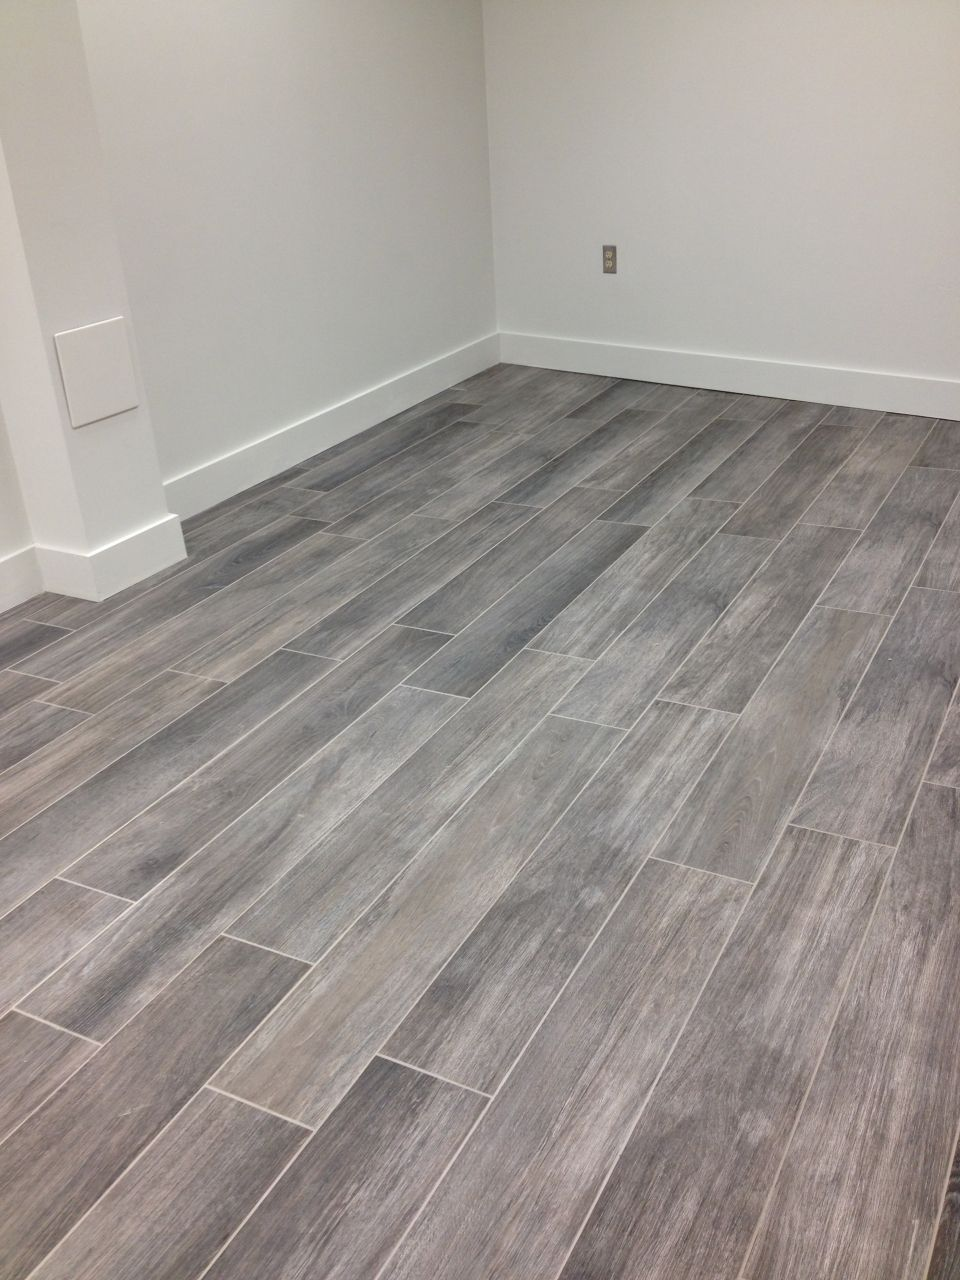 tile wood floor gray wood tile floor no3lcd6n8 RYZSFGL